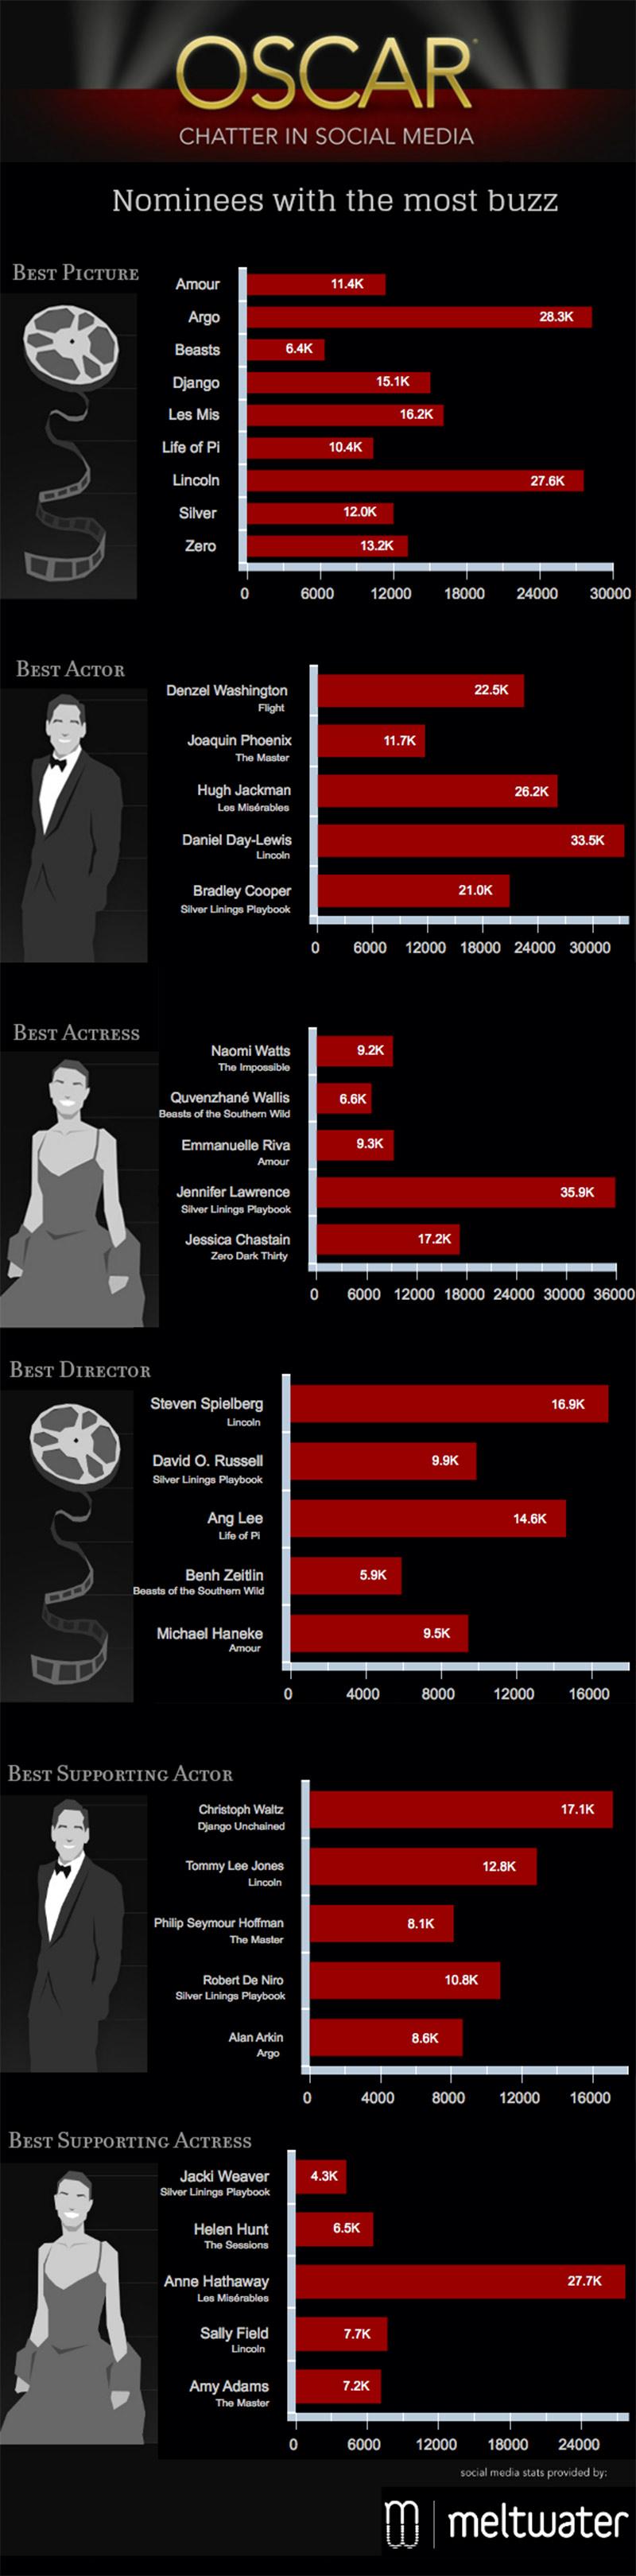 Social Media Predicts Oscar Winners